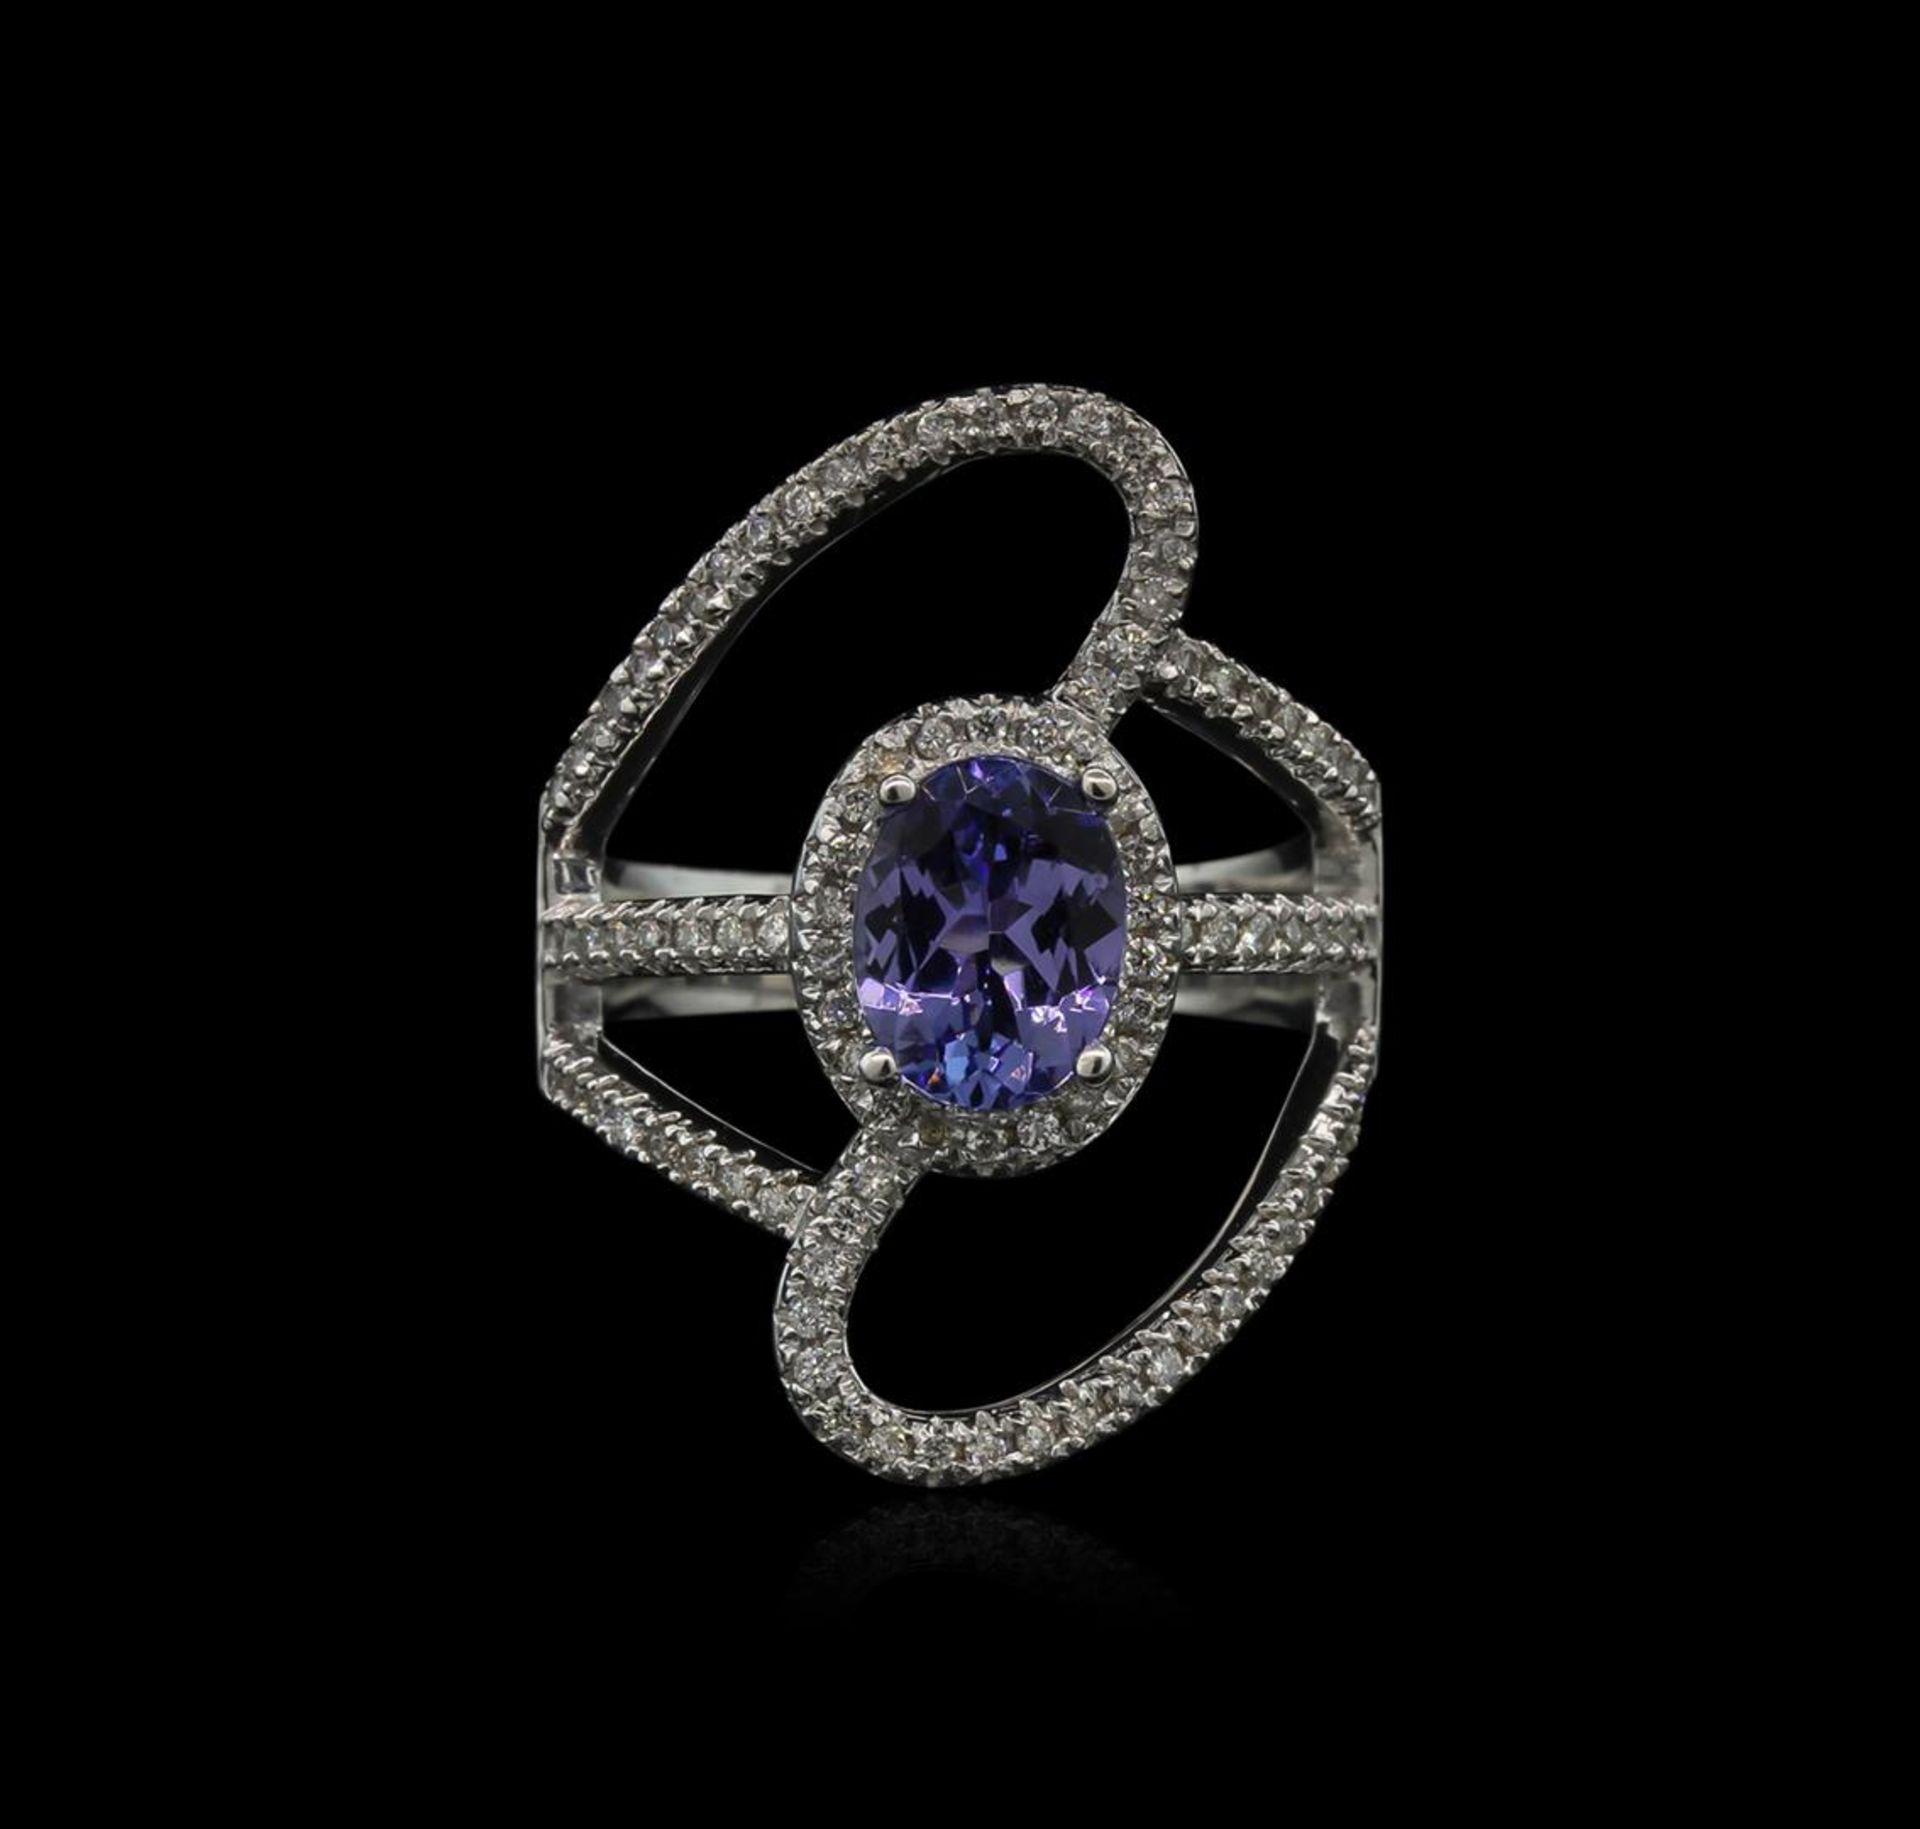 1.50 ctw Tanzanite and Diamond Ring - 14KT White Gold - Image 2 of 2